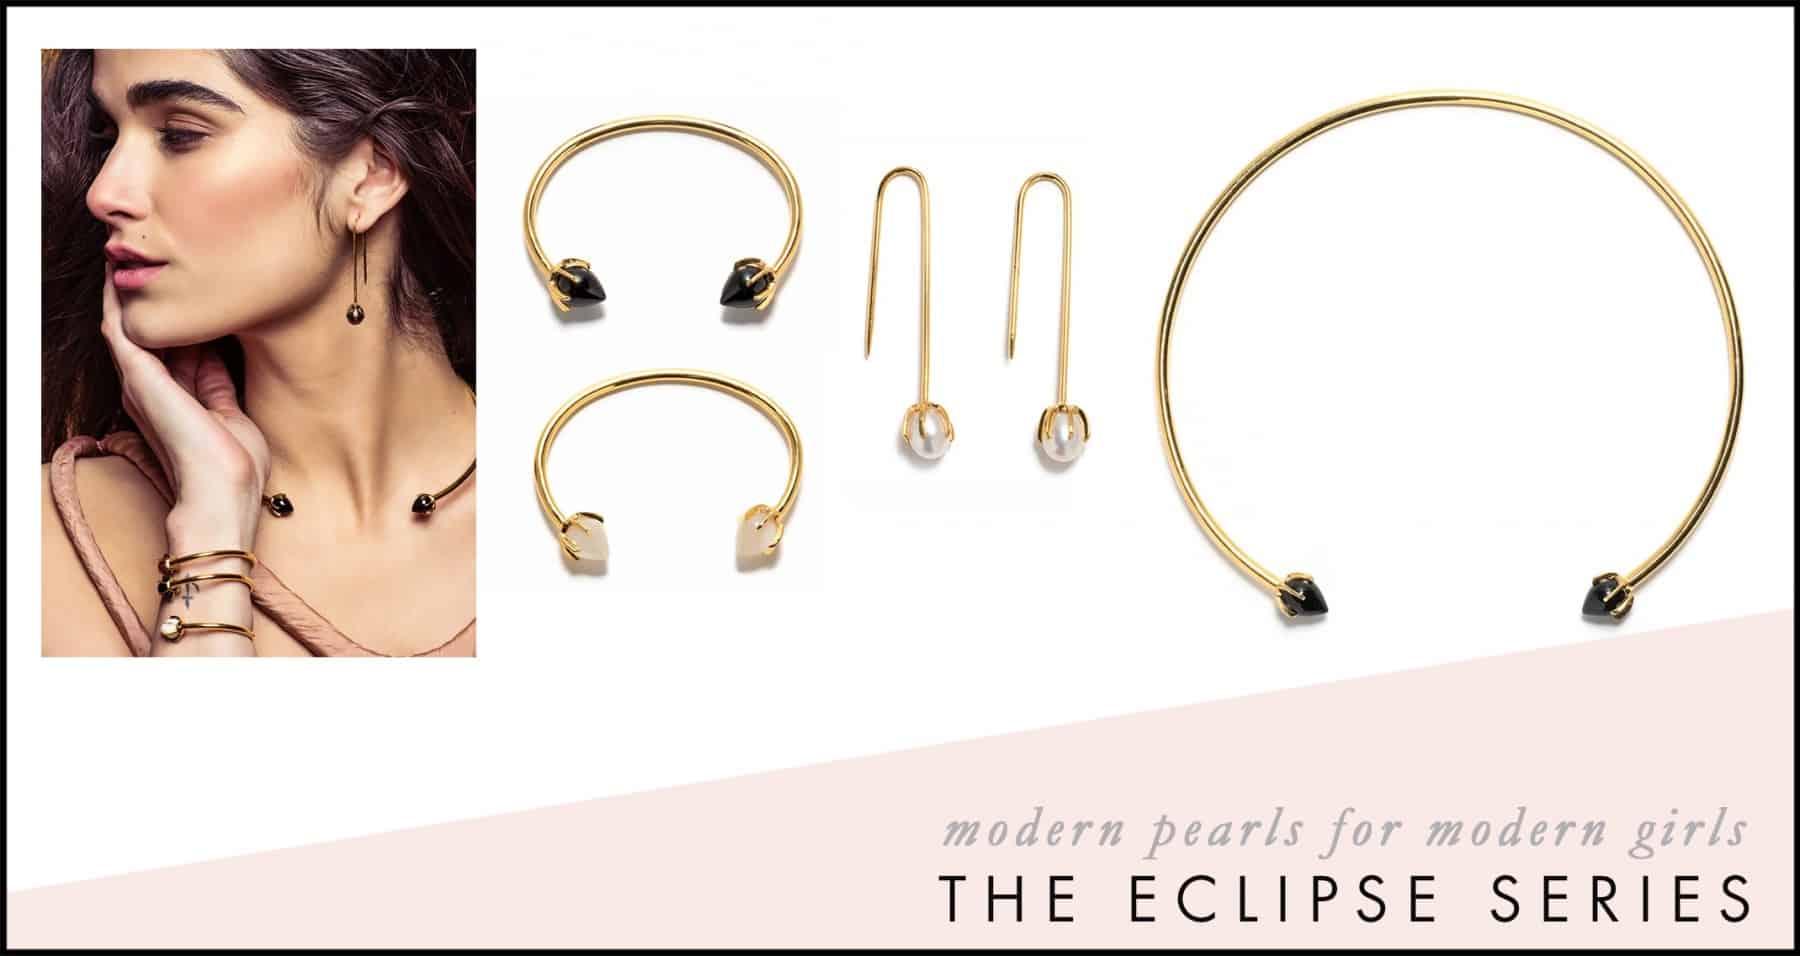 Eclipse Necklace Neiman Marcus Saks Pearls Wire Collar